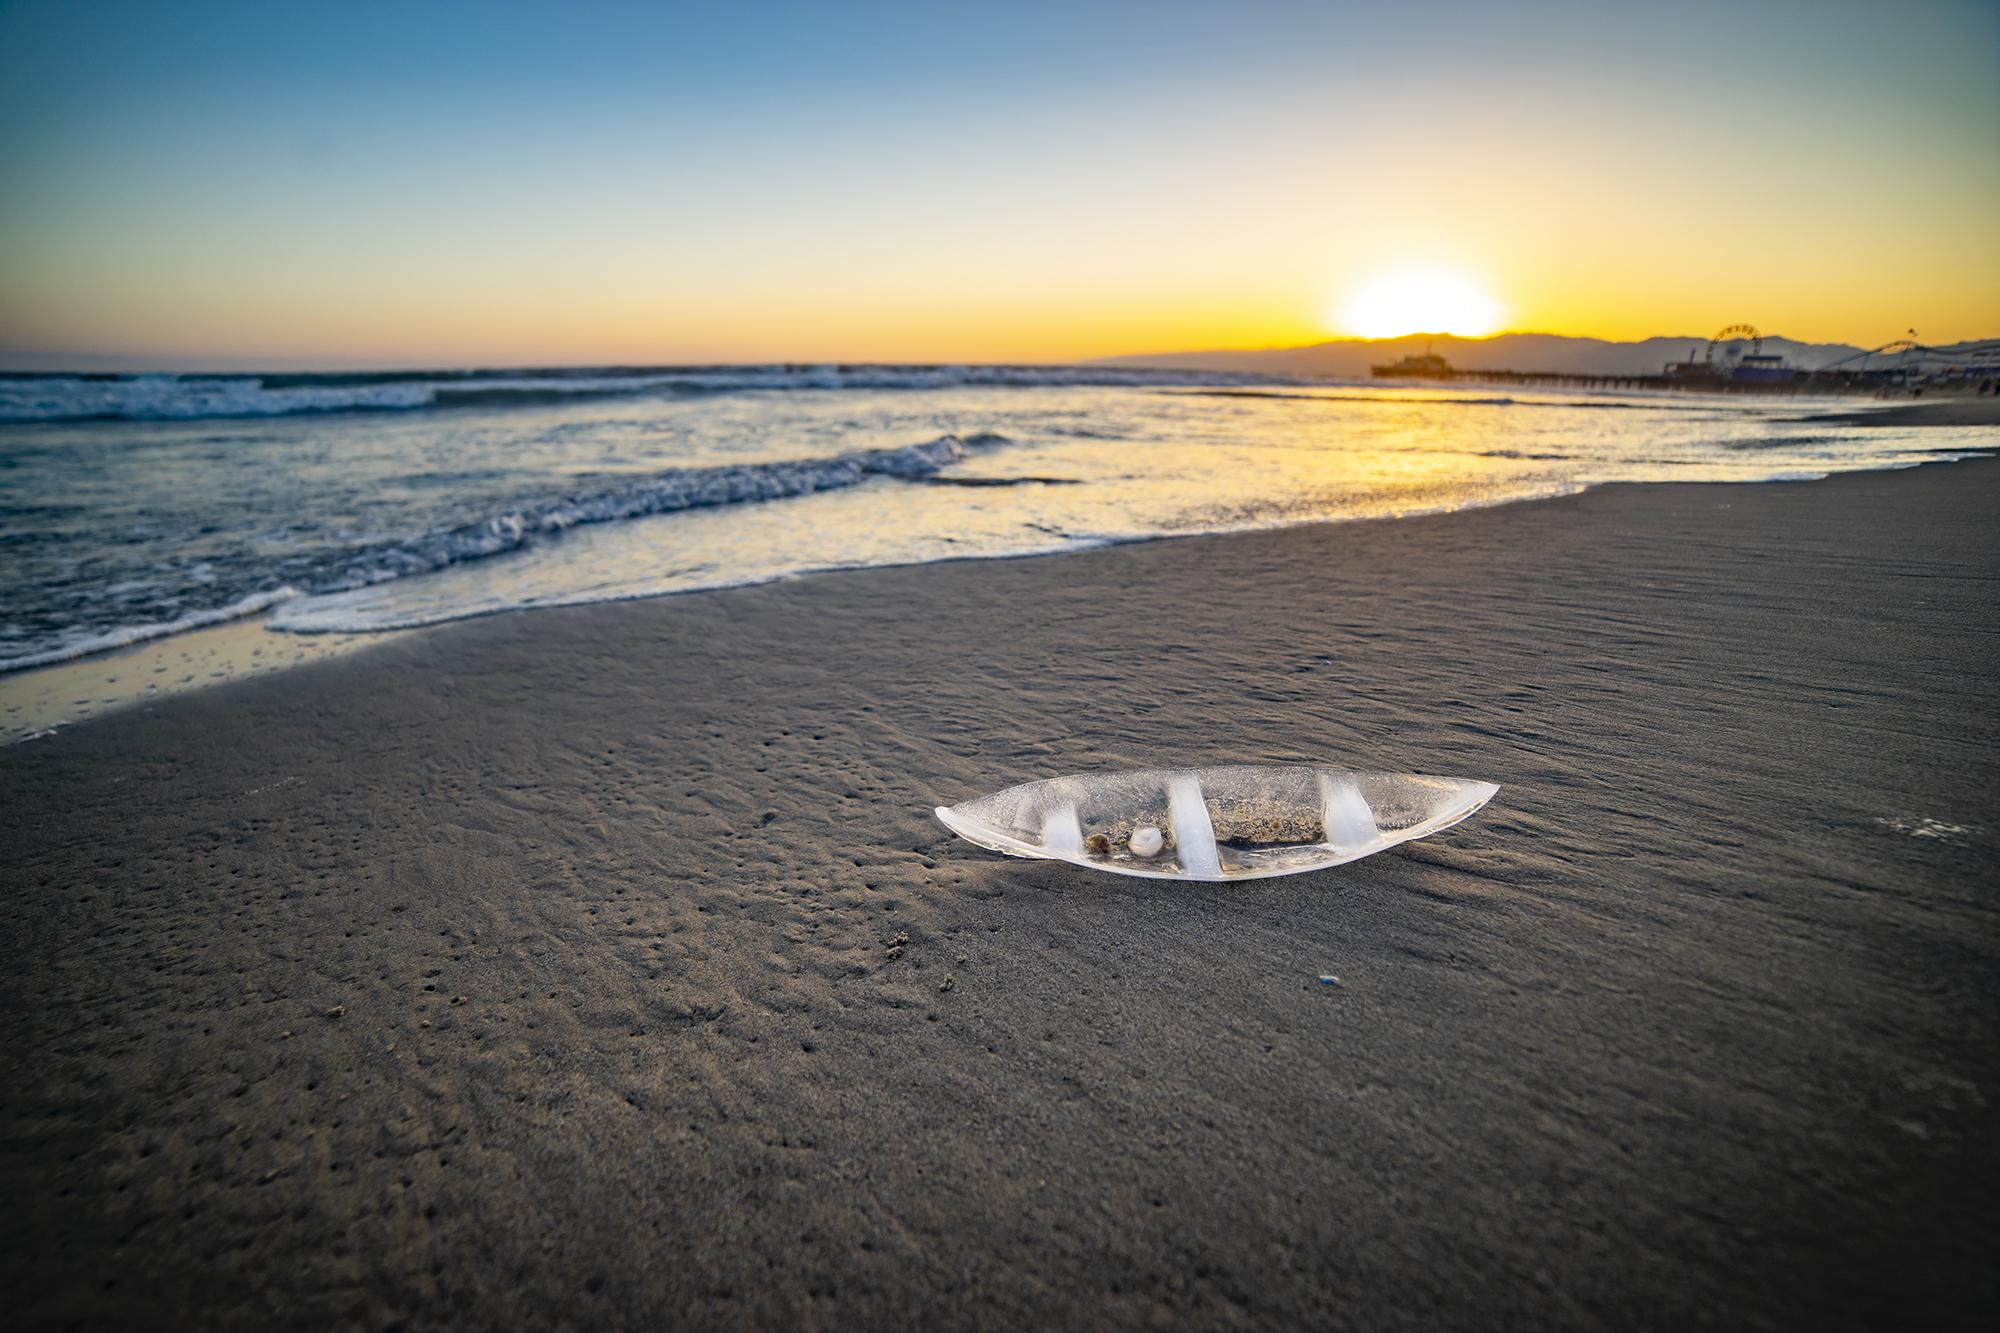 Ice Boat, Santa Monica, CA 2019